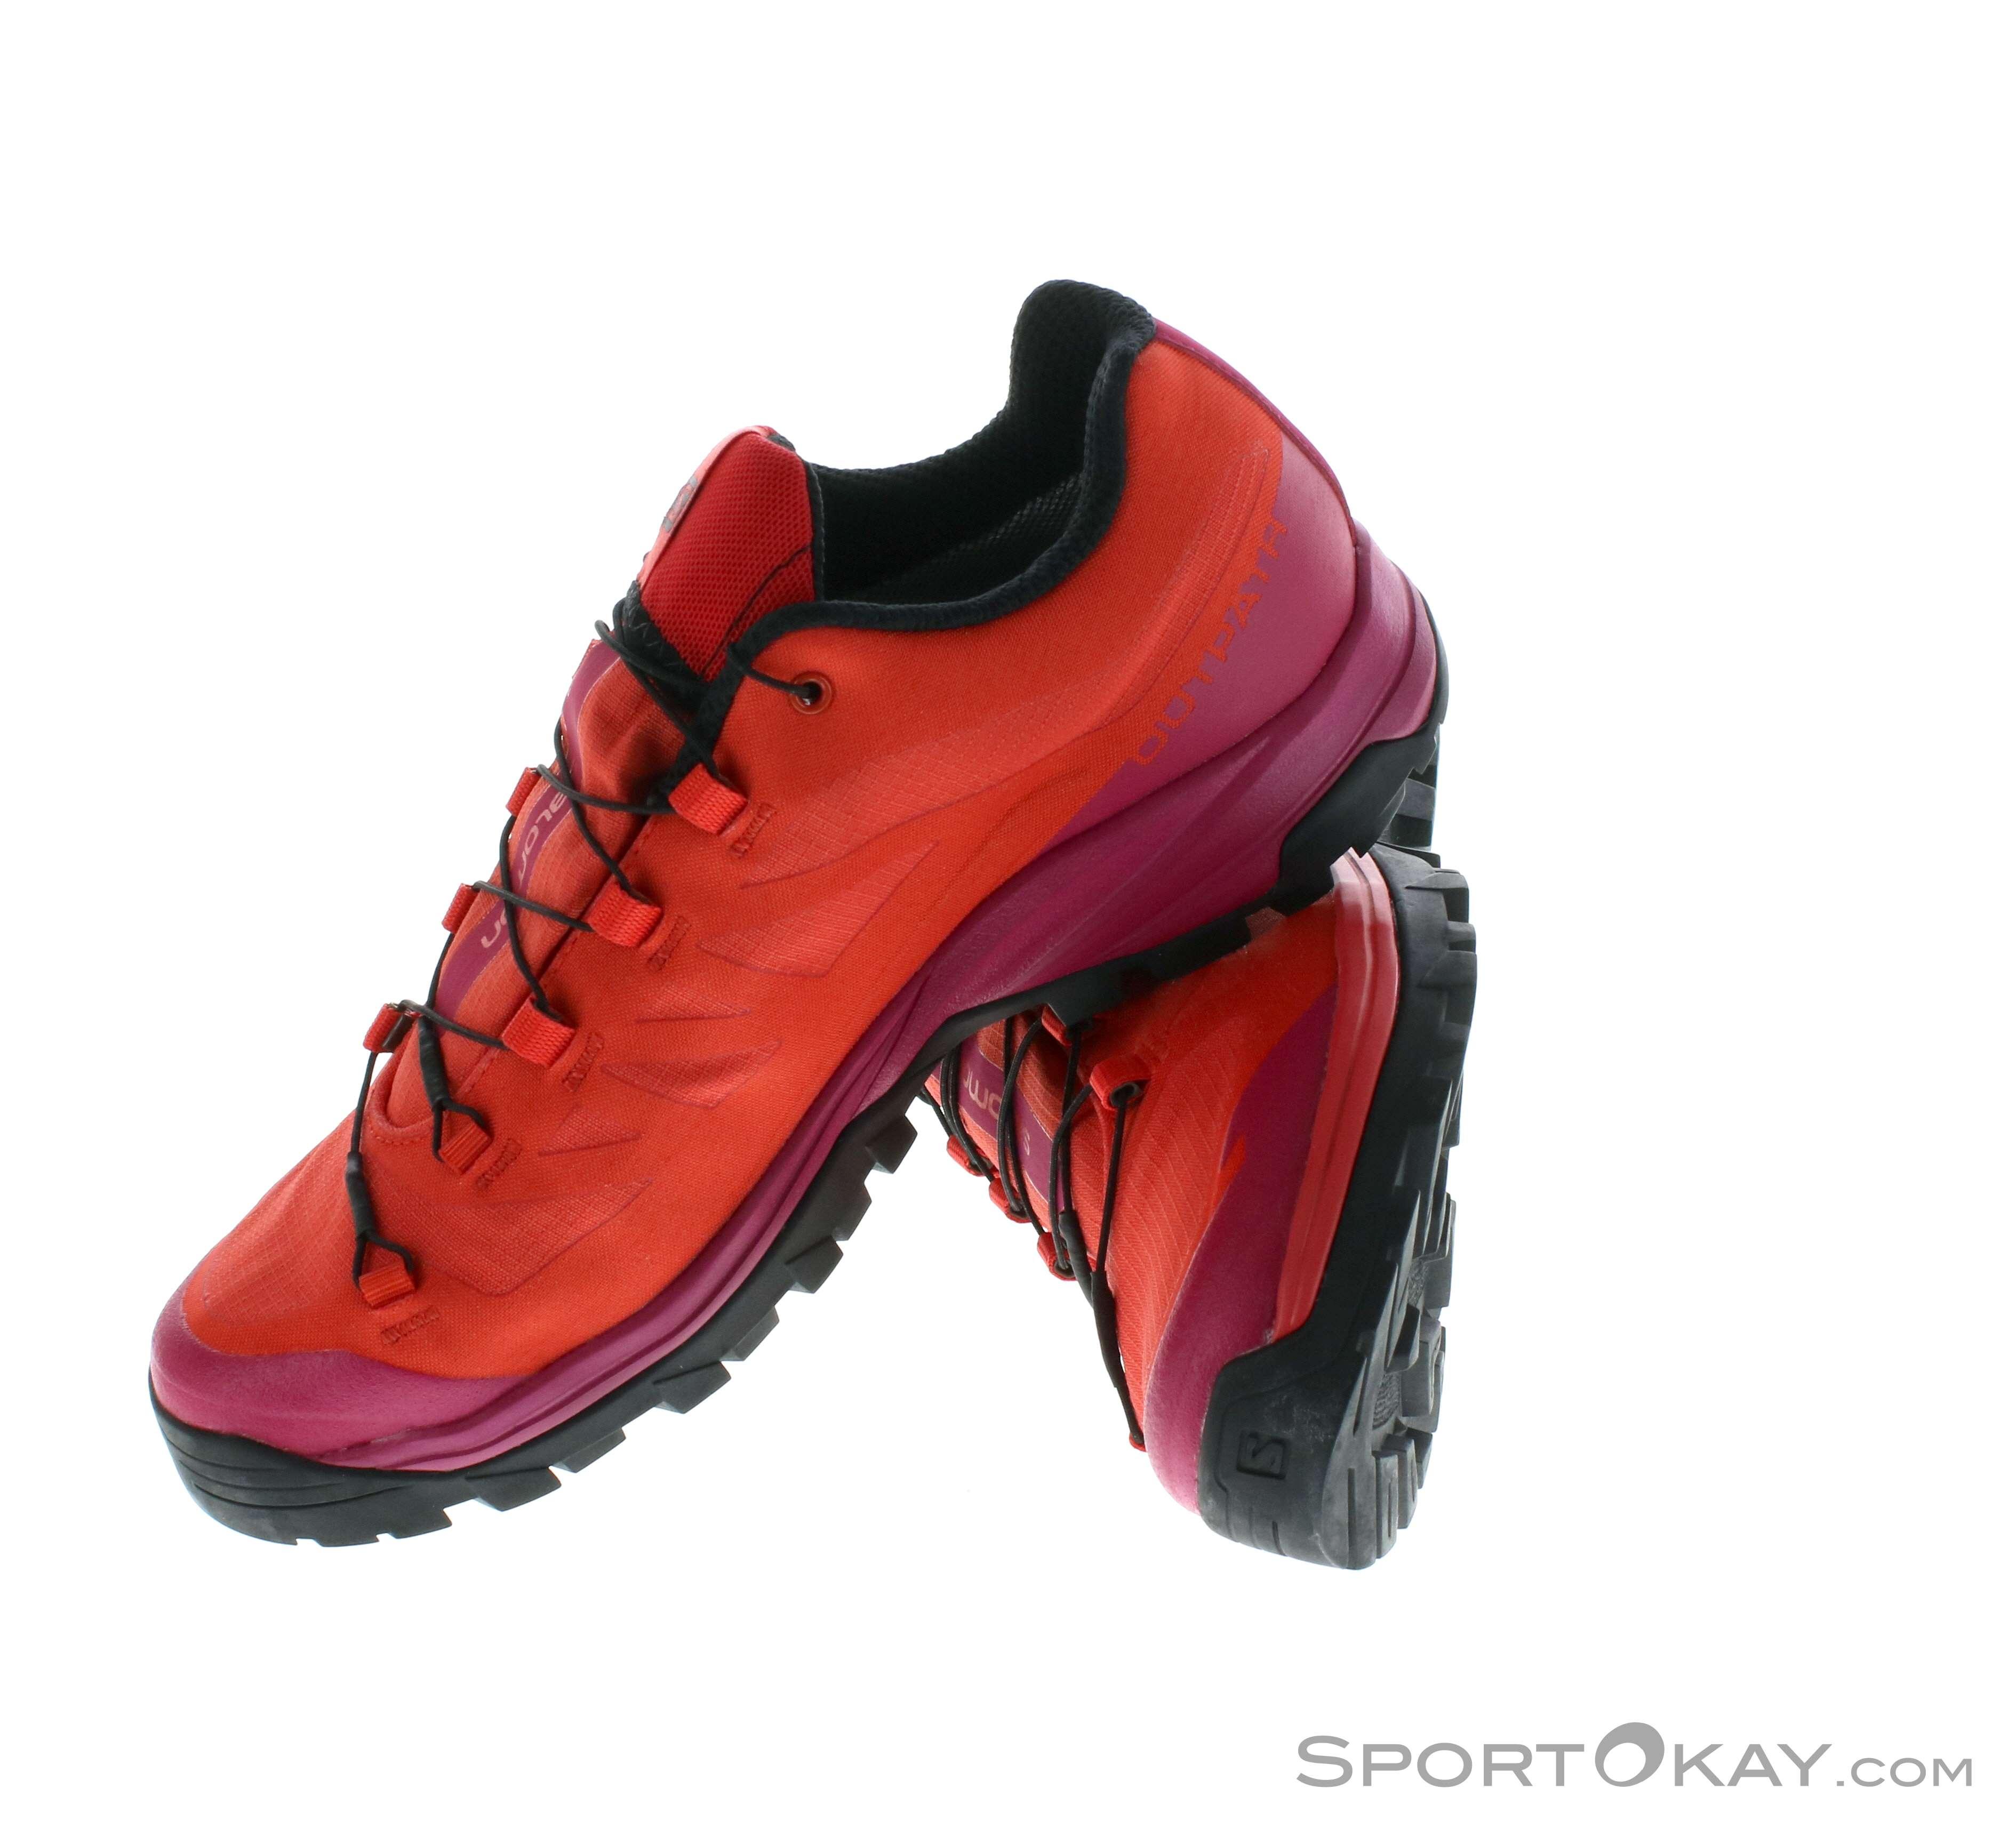 Salomon Salomon Outpath GTX Womens Trekking Shoes Gore Tex